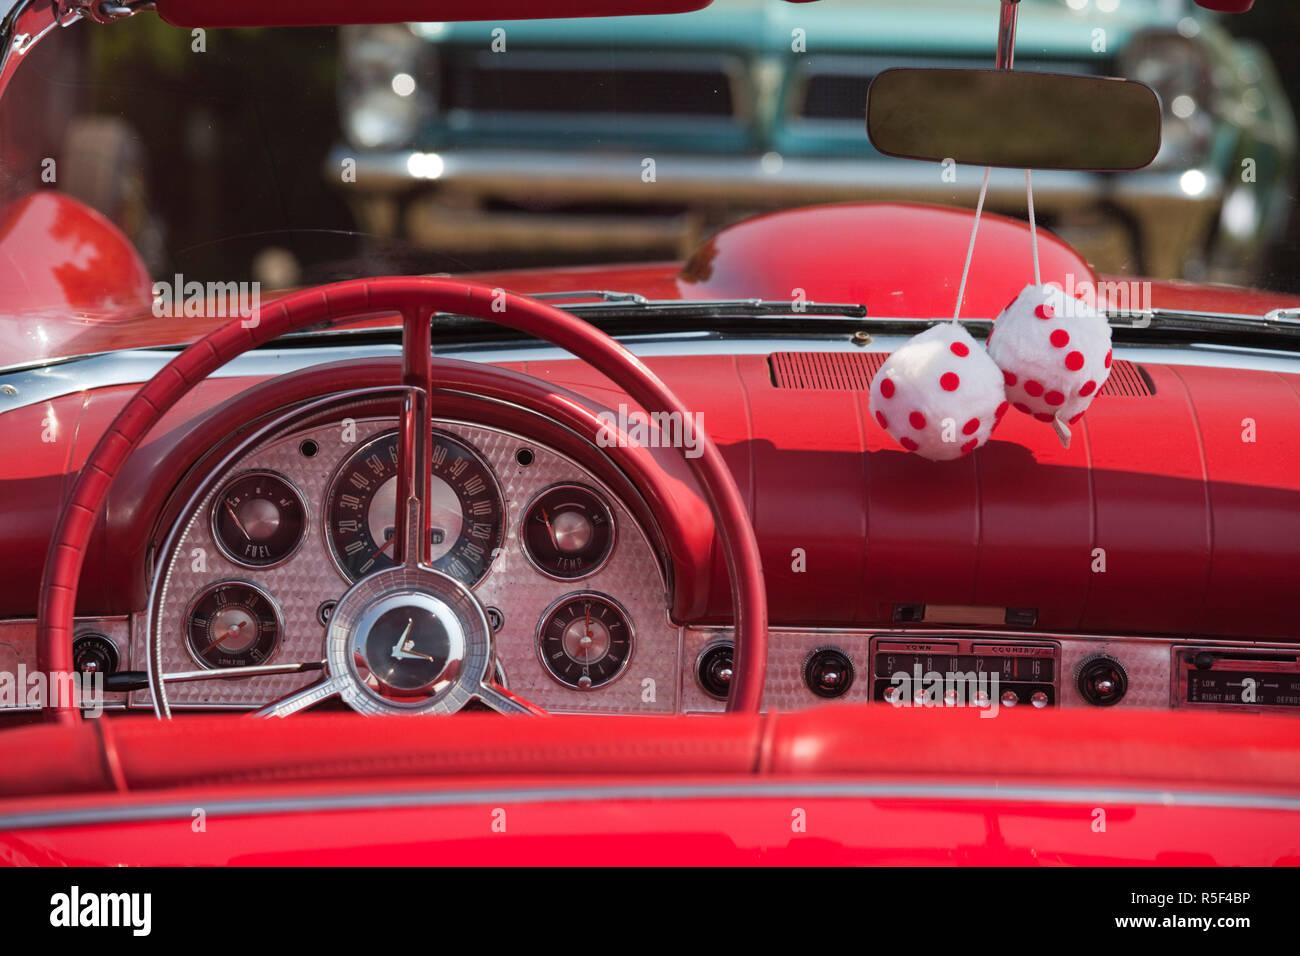 USA, Massachusetts, Cape Ann, Gloucester, antique car show, fuzzy dice in 1950's-era convertible - Stock Image